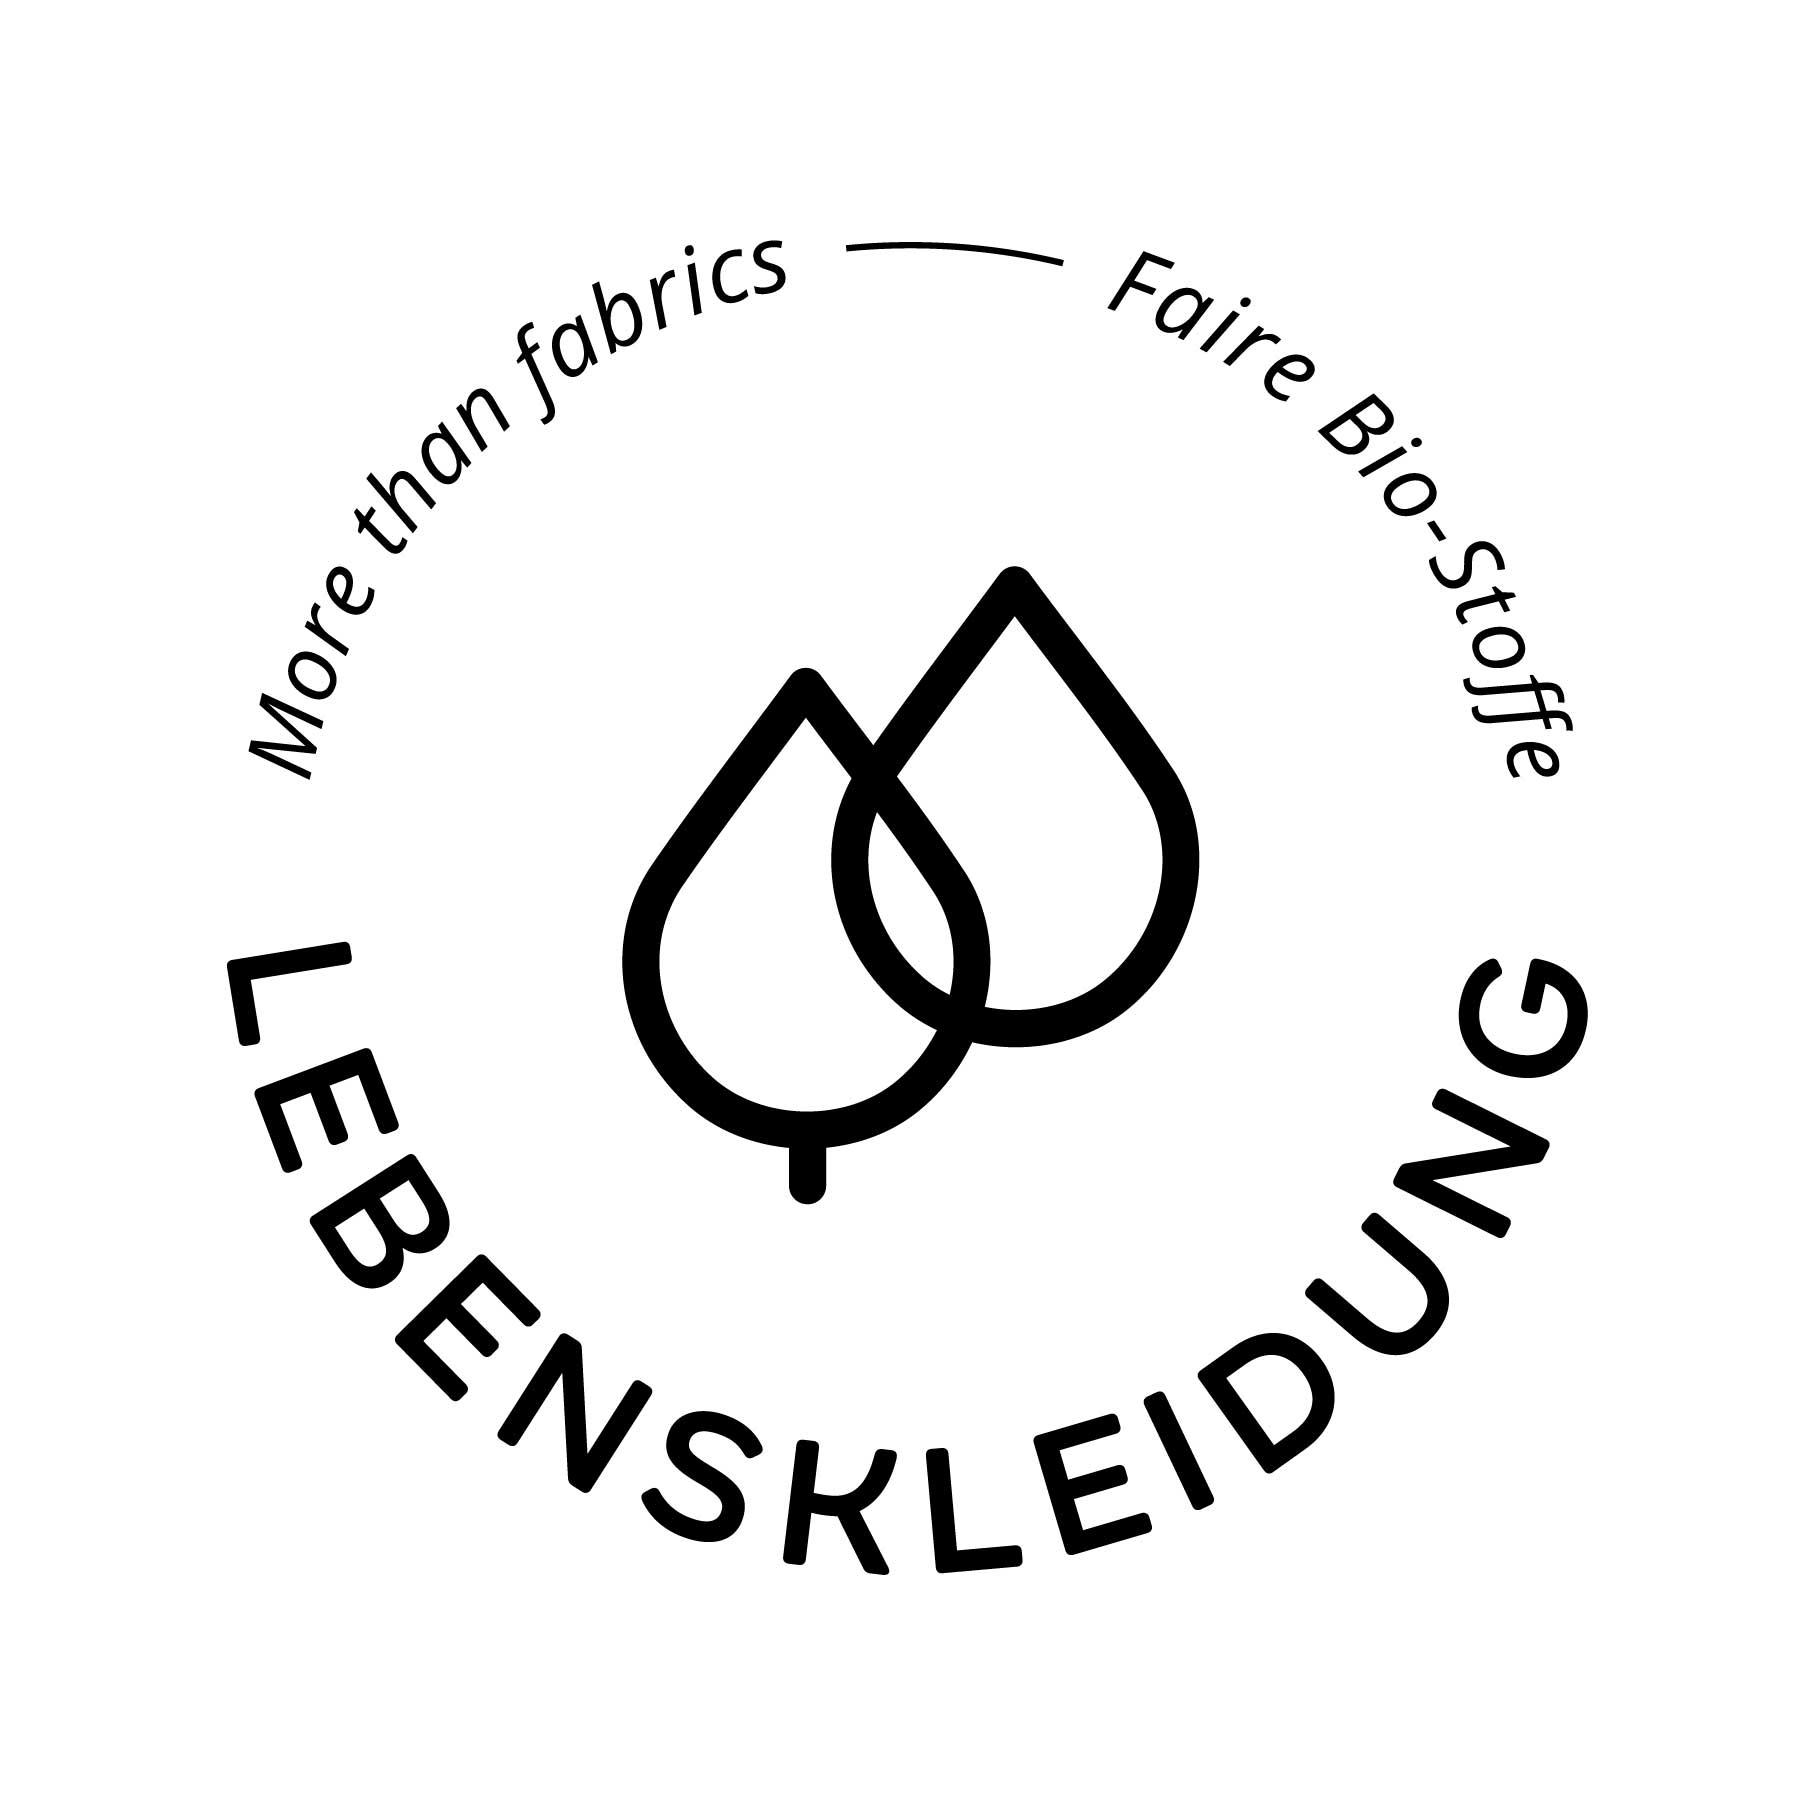 Tela orgánica RIB 2x1 (Puños) Tela - Copper Marl-2